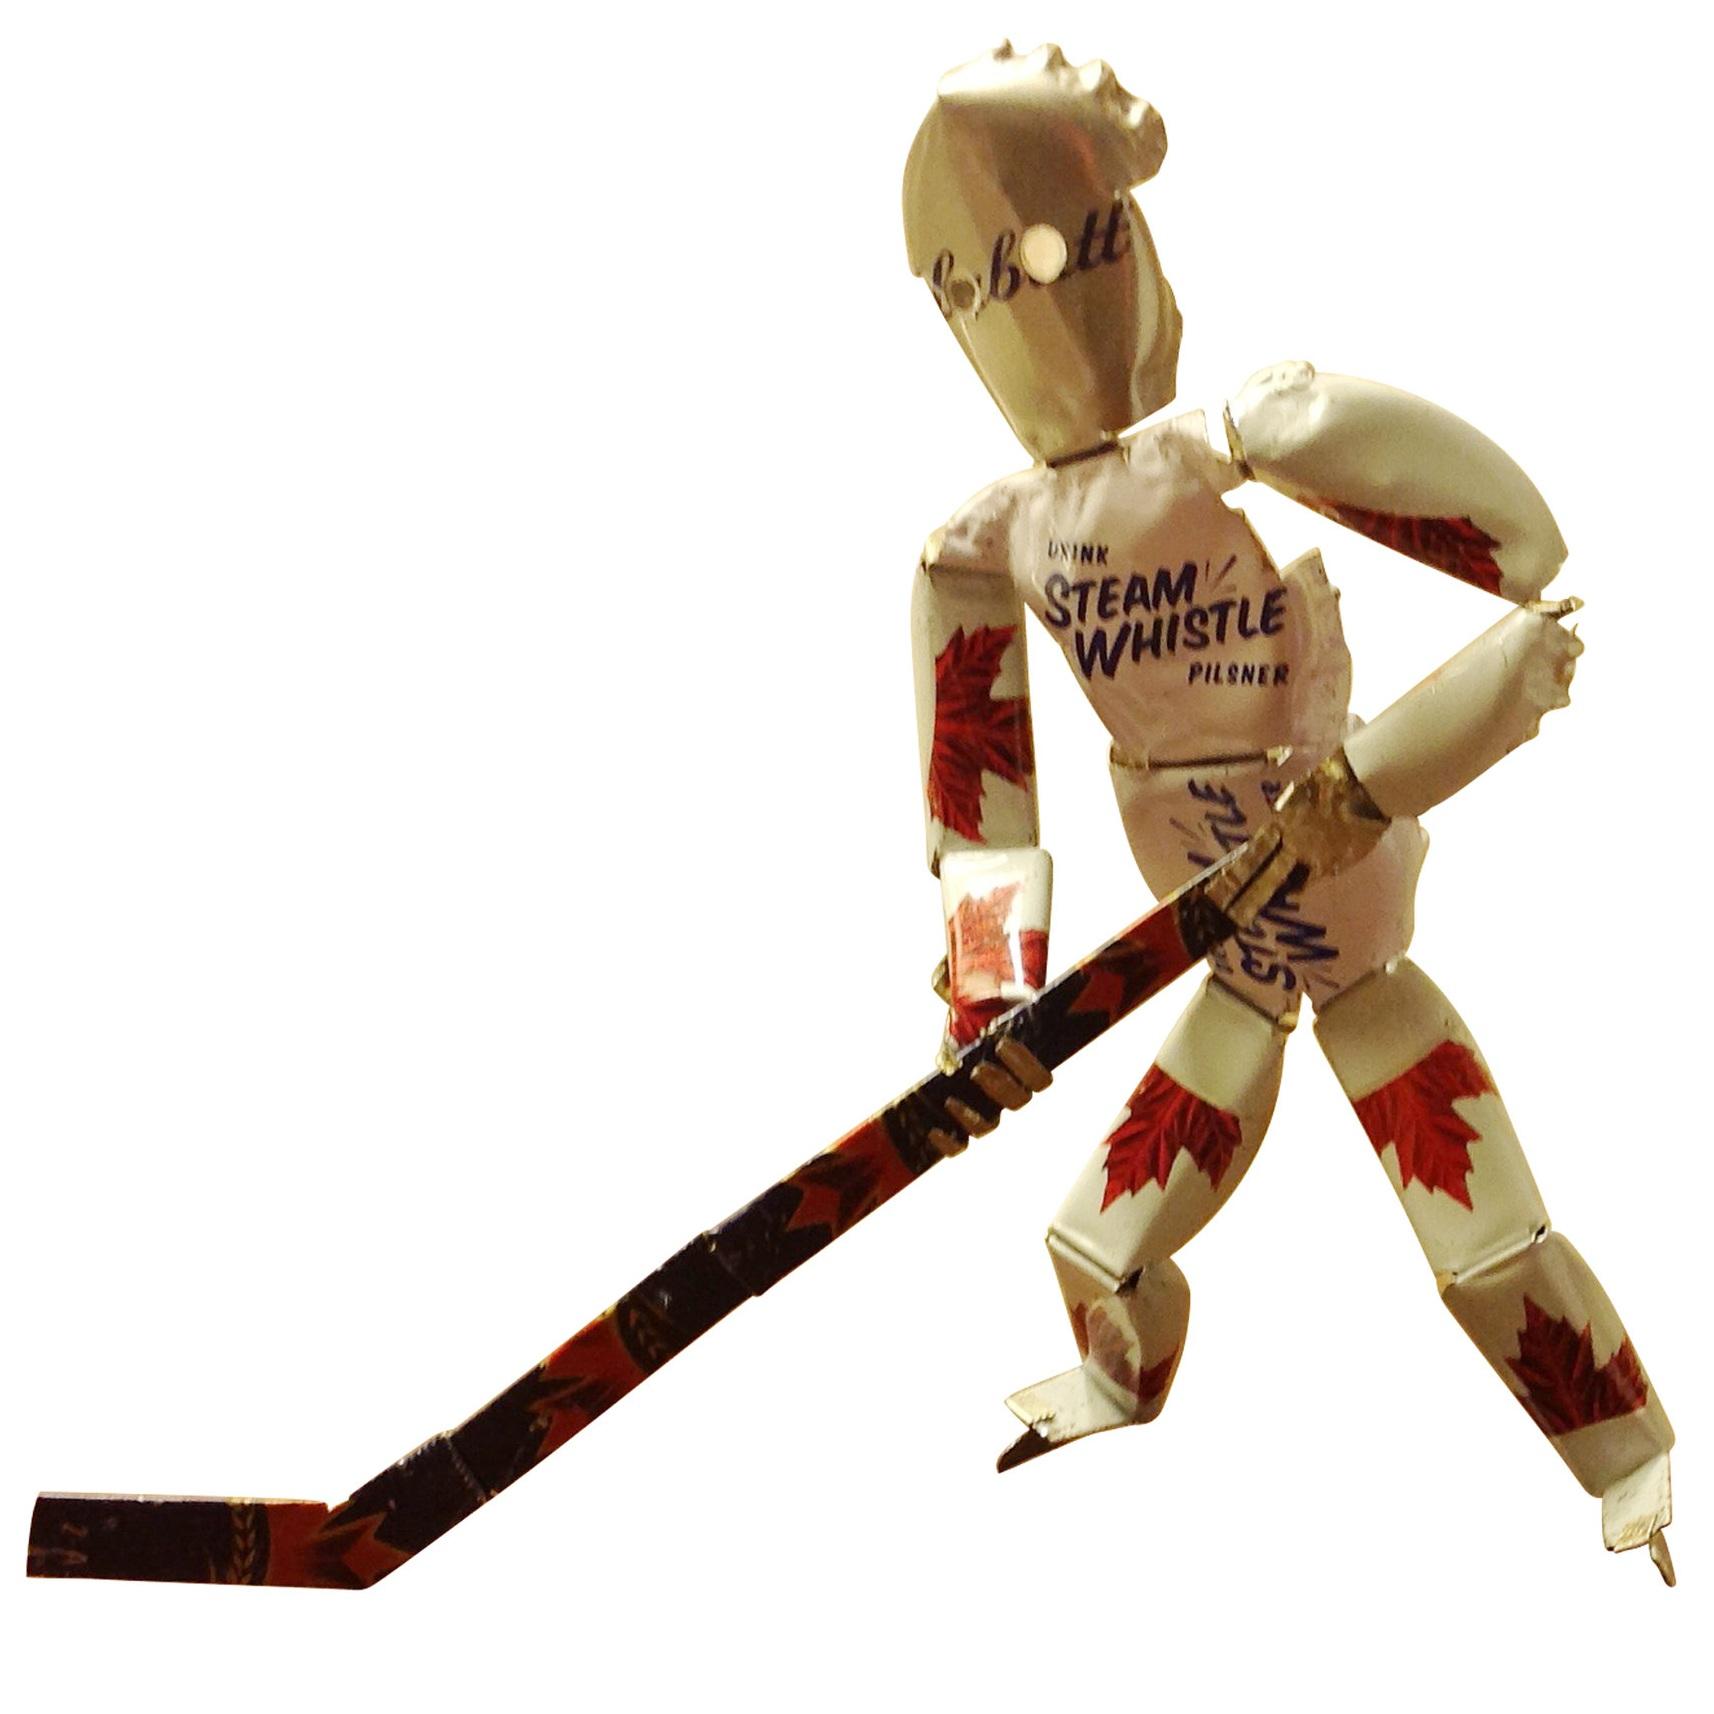 hockey player 1 copy.jpg